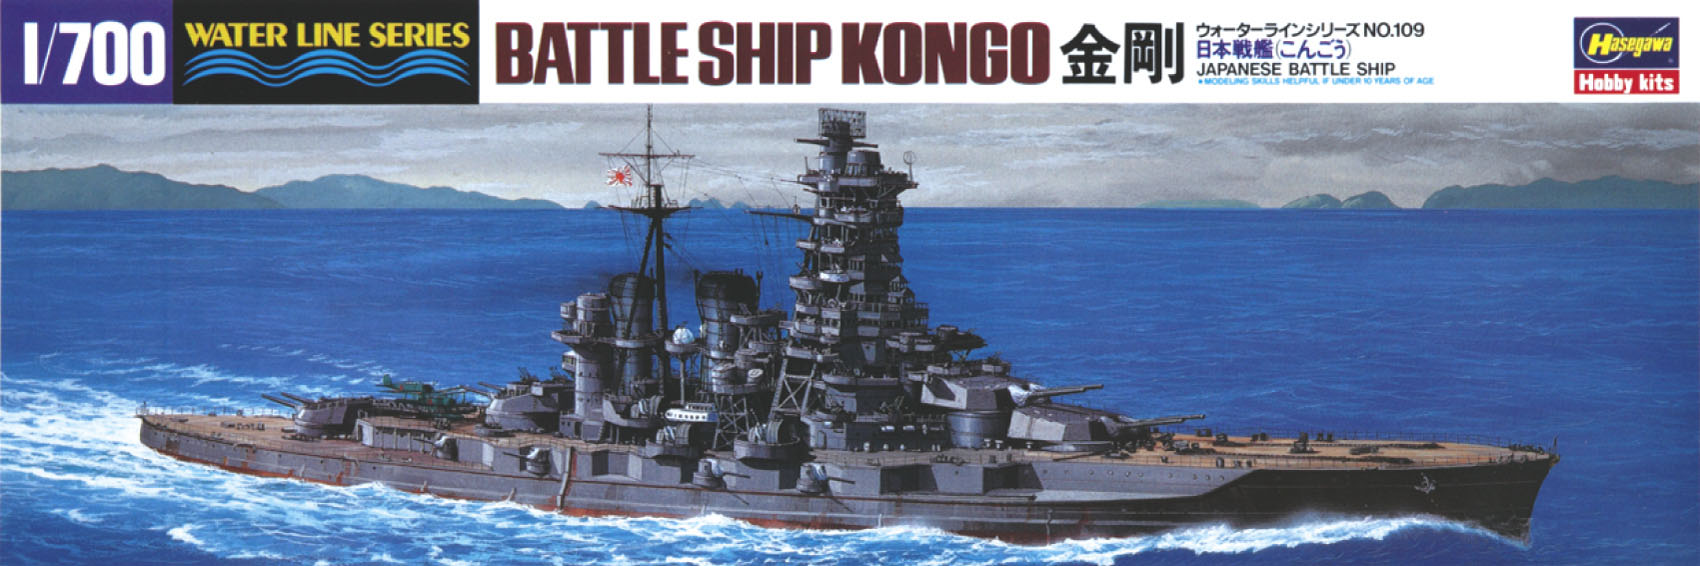 Hasegawa Ijn Battleship Kongo